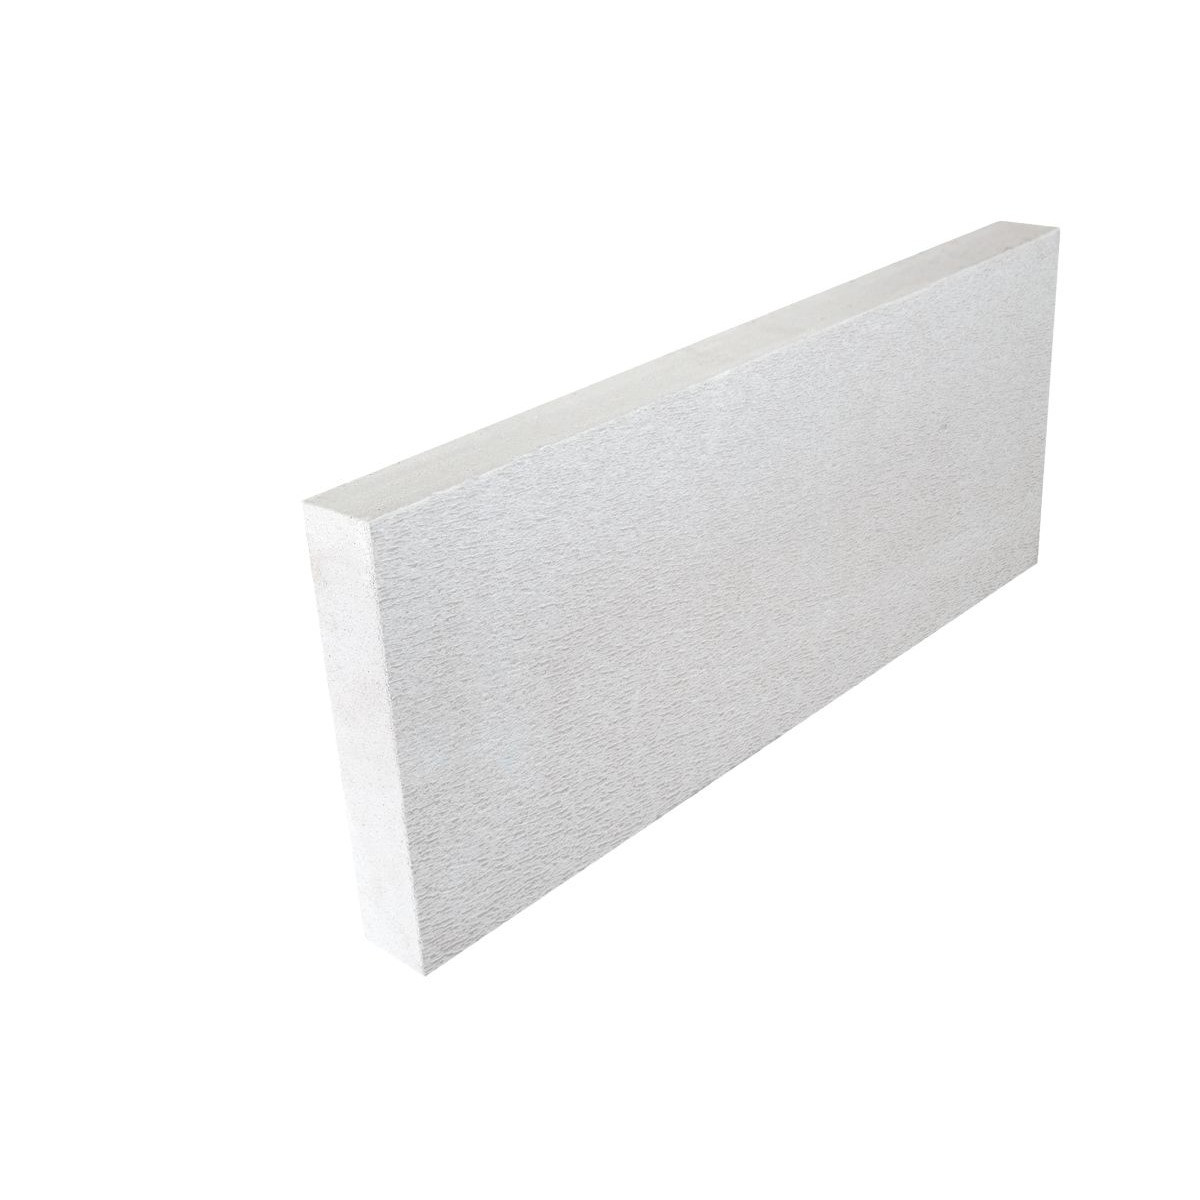 Блок из ячеист. бетона Бонолит  600х250х75 мм  (поддон-160шт.)